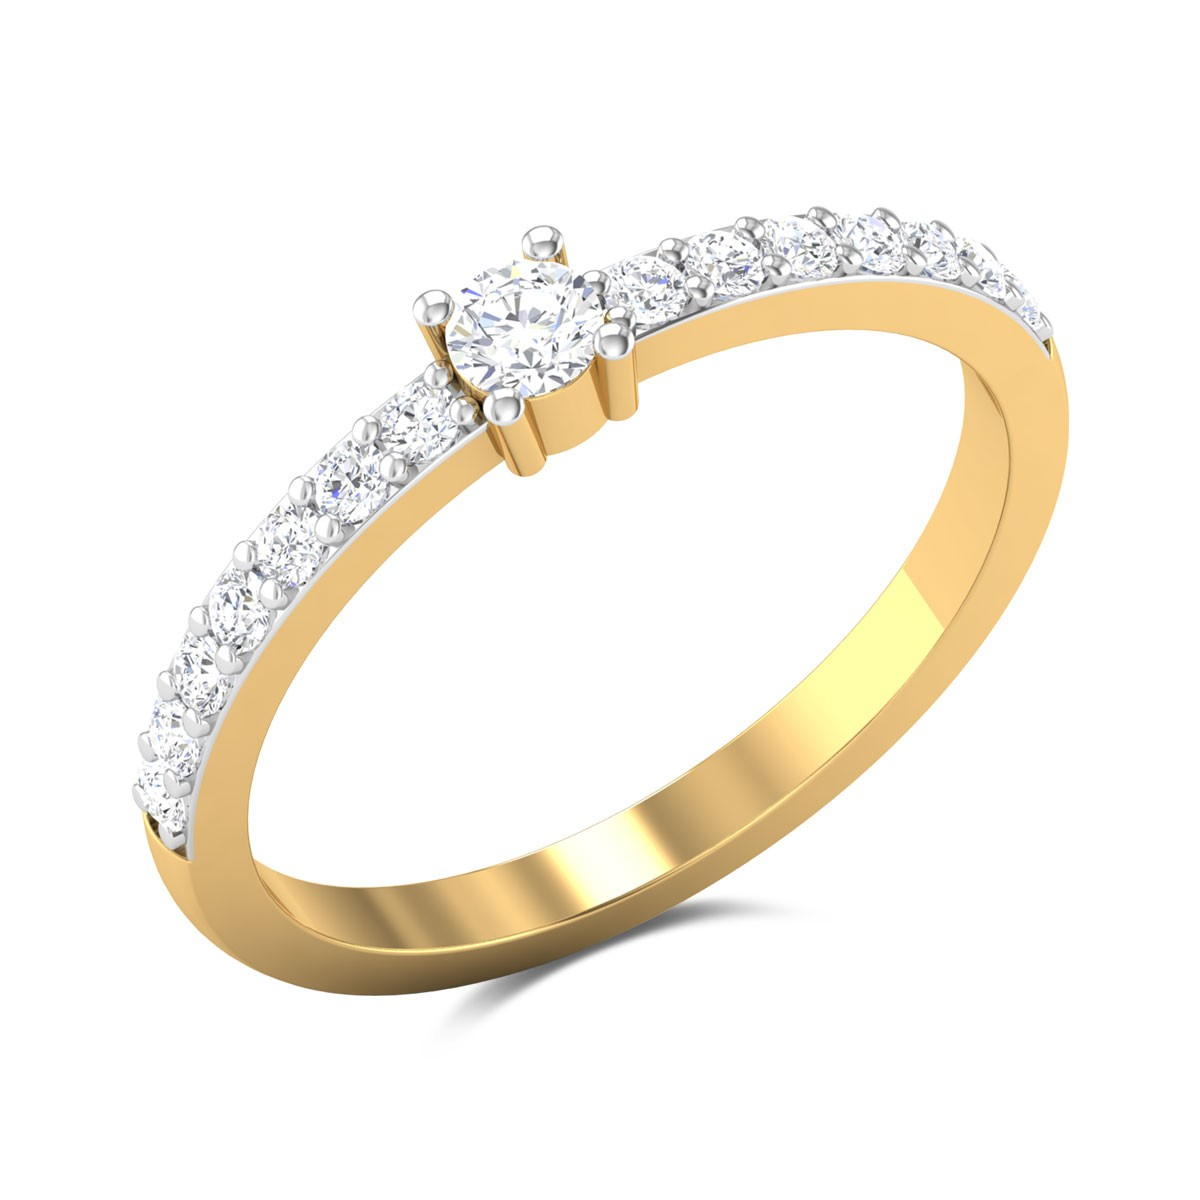 Peach Blossom Diamond Ring